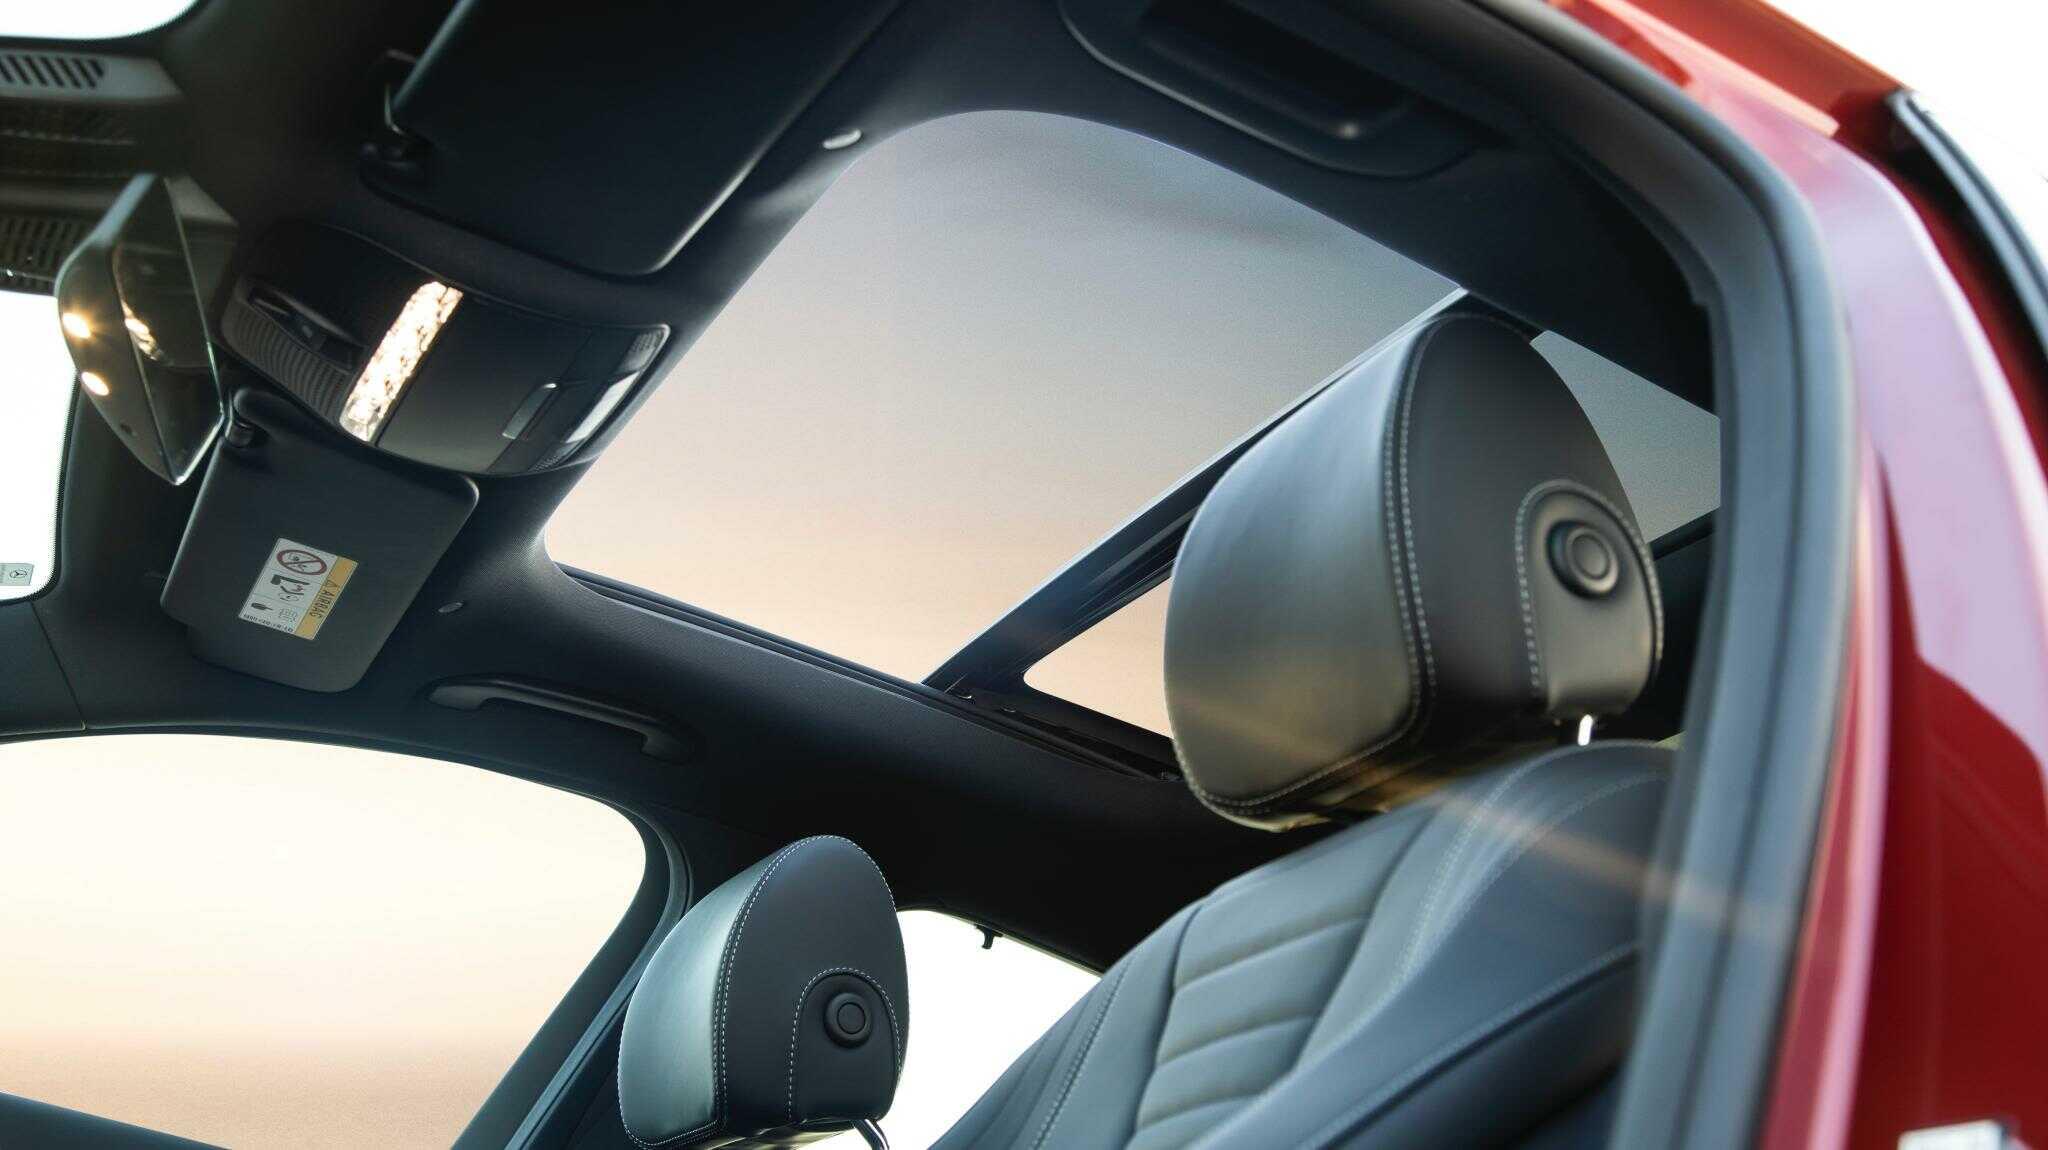 Mercedes E300 AMG 2022